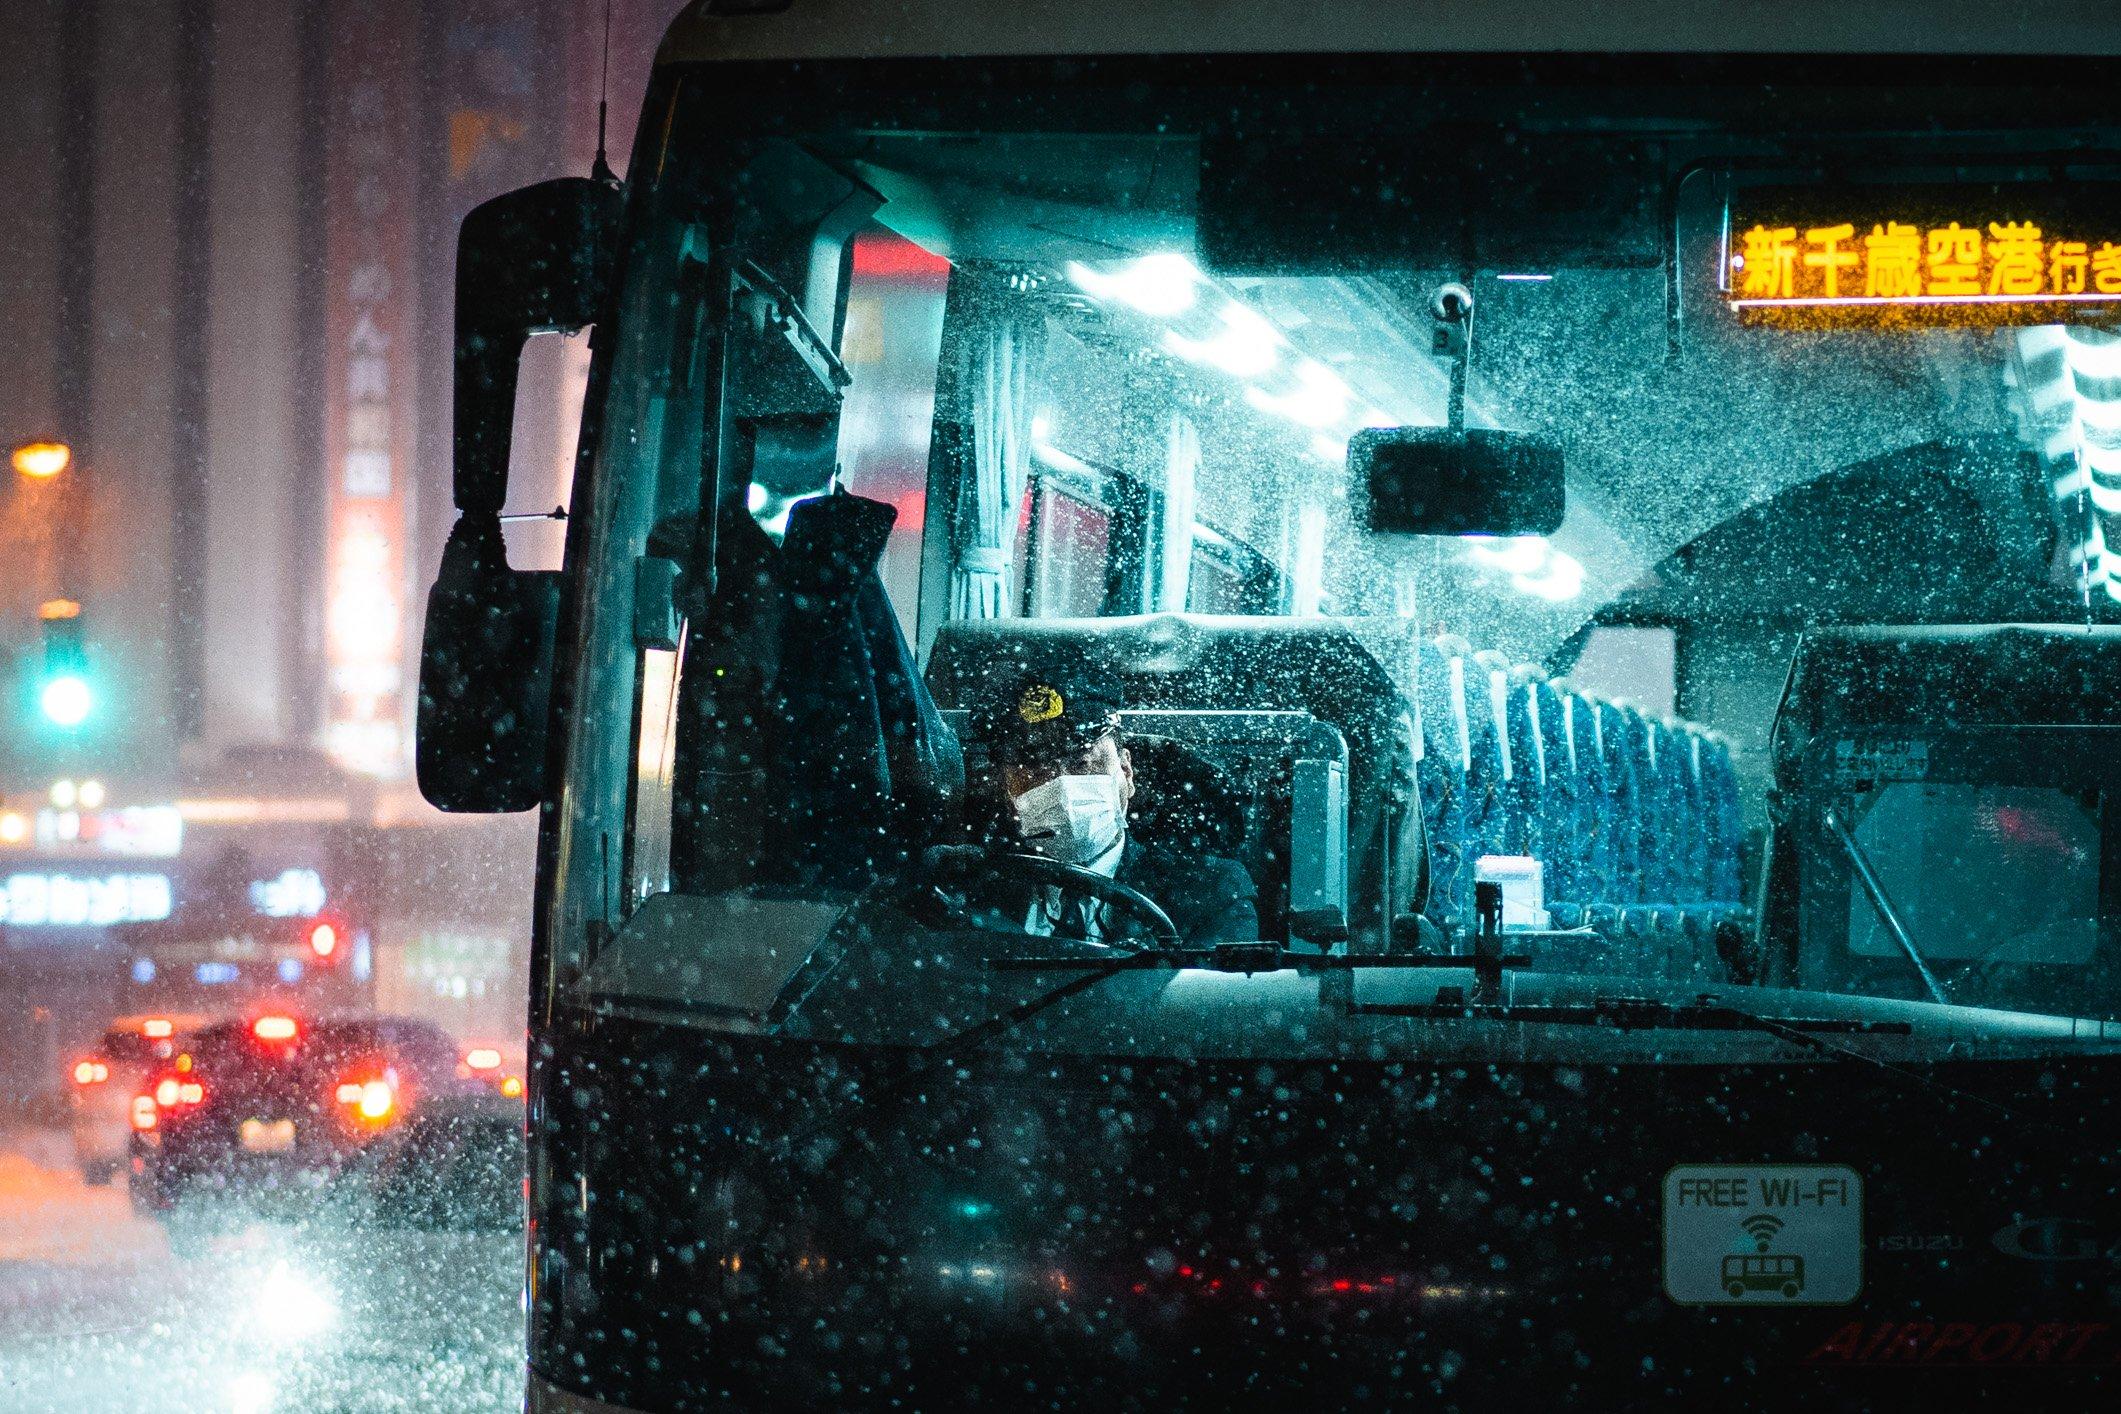 Snowy Street Photography in Sapporo, Japan, a Hidden Gem